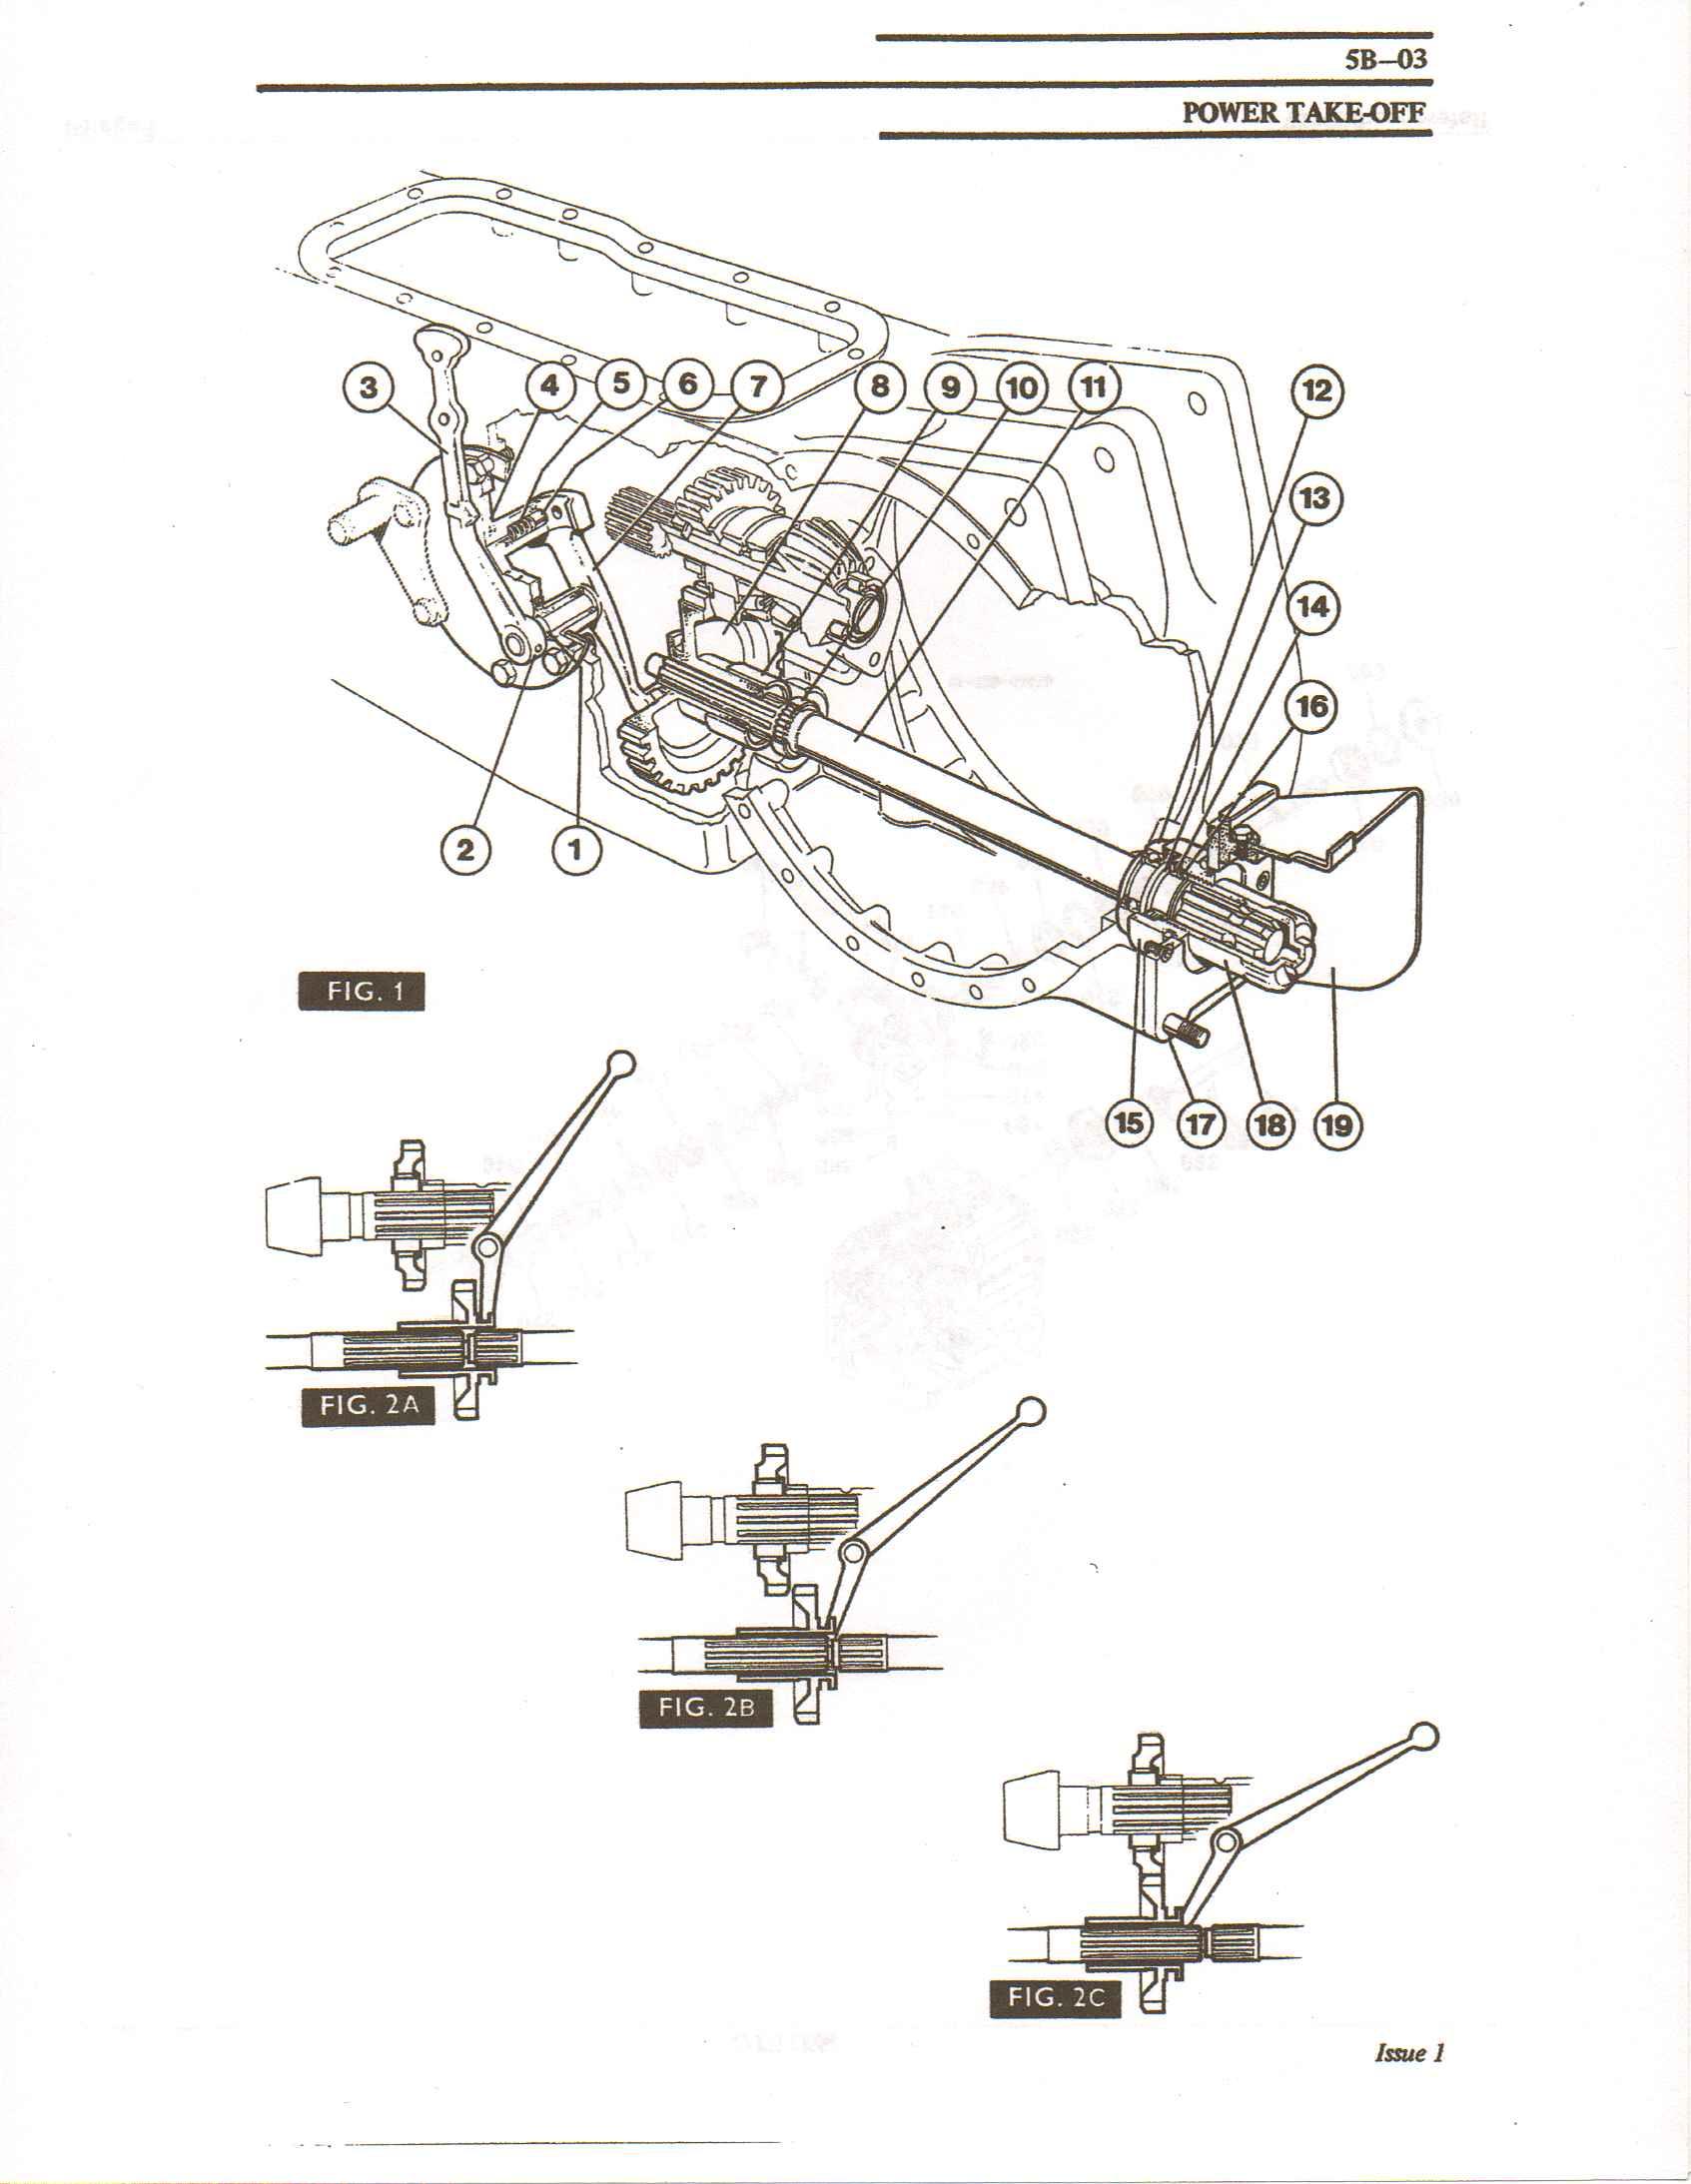 Mf 1130 Wiring Diagram Auto Electrical Sbp2 Pendant Crane For Mey Ferguson 35 To 20